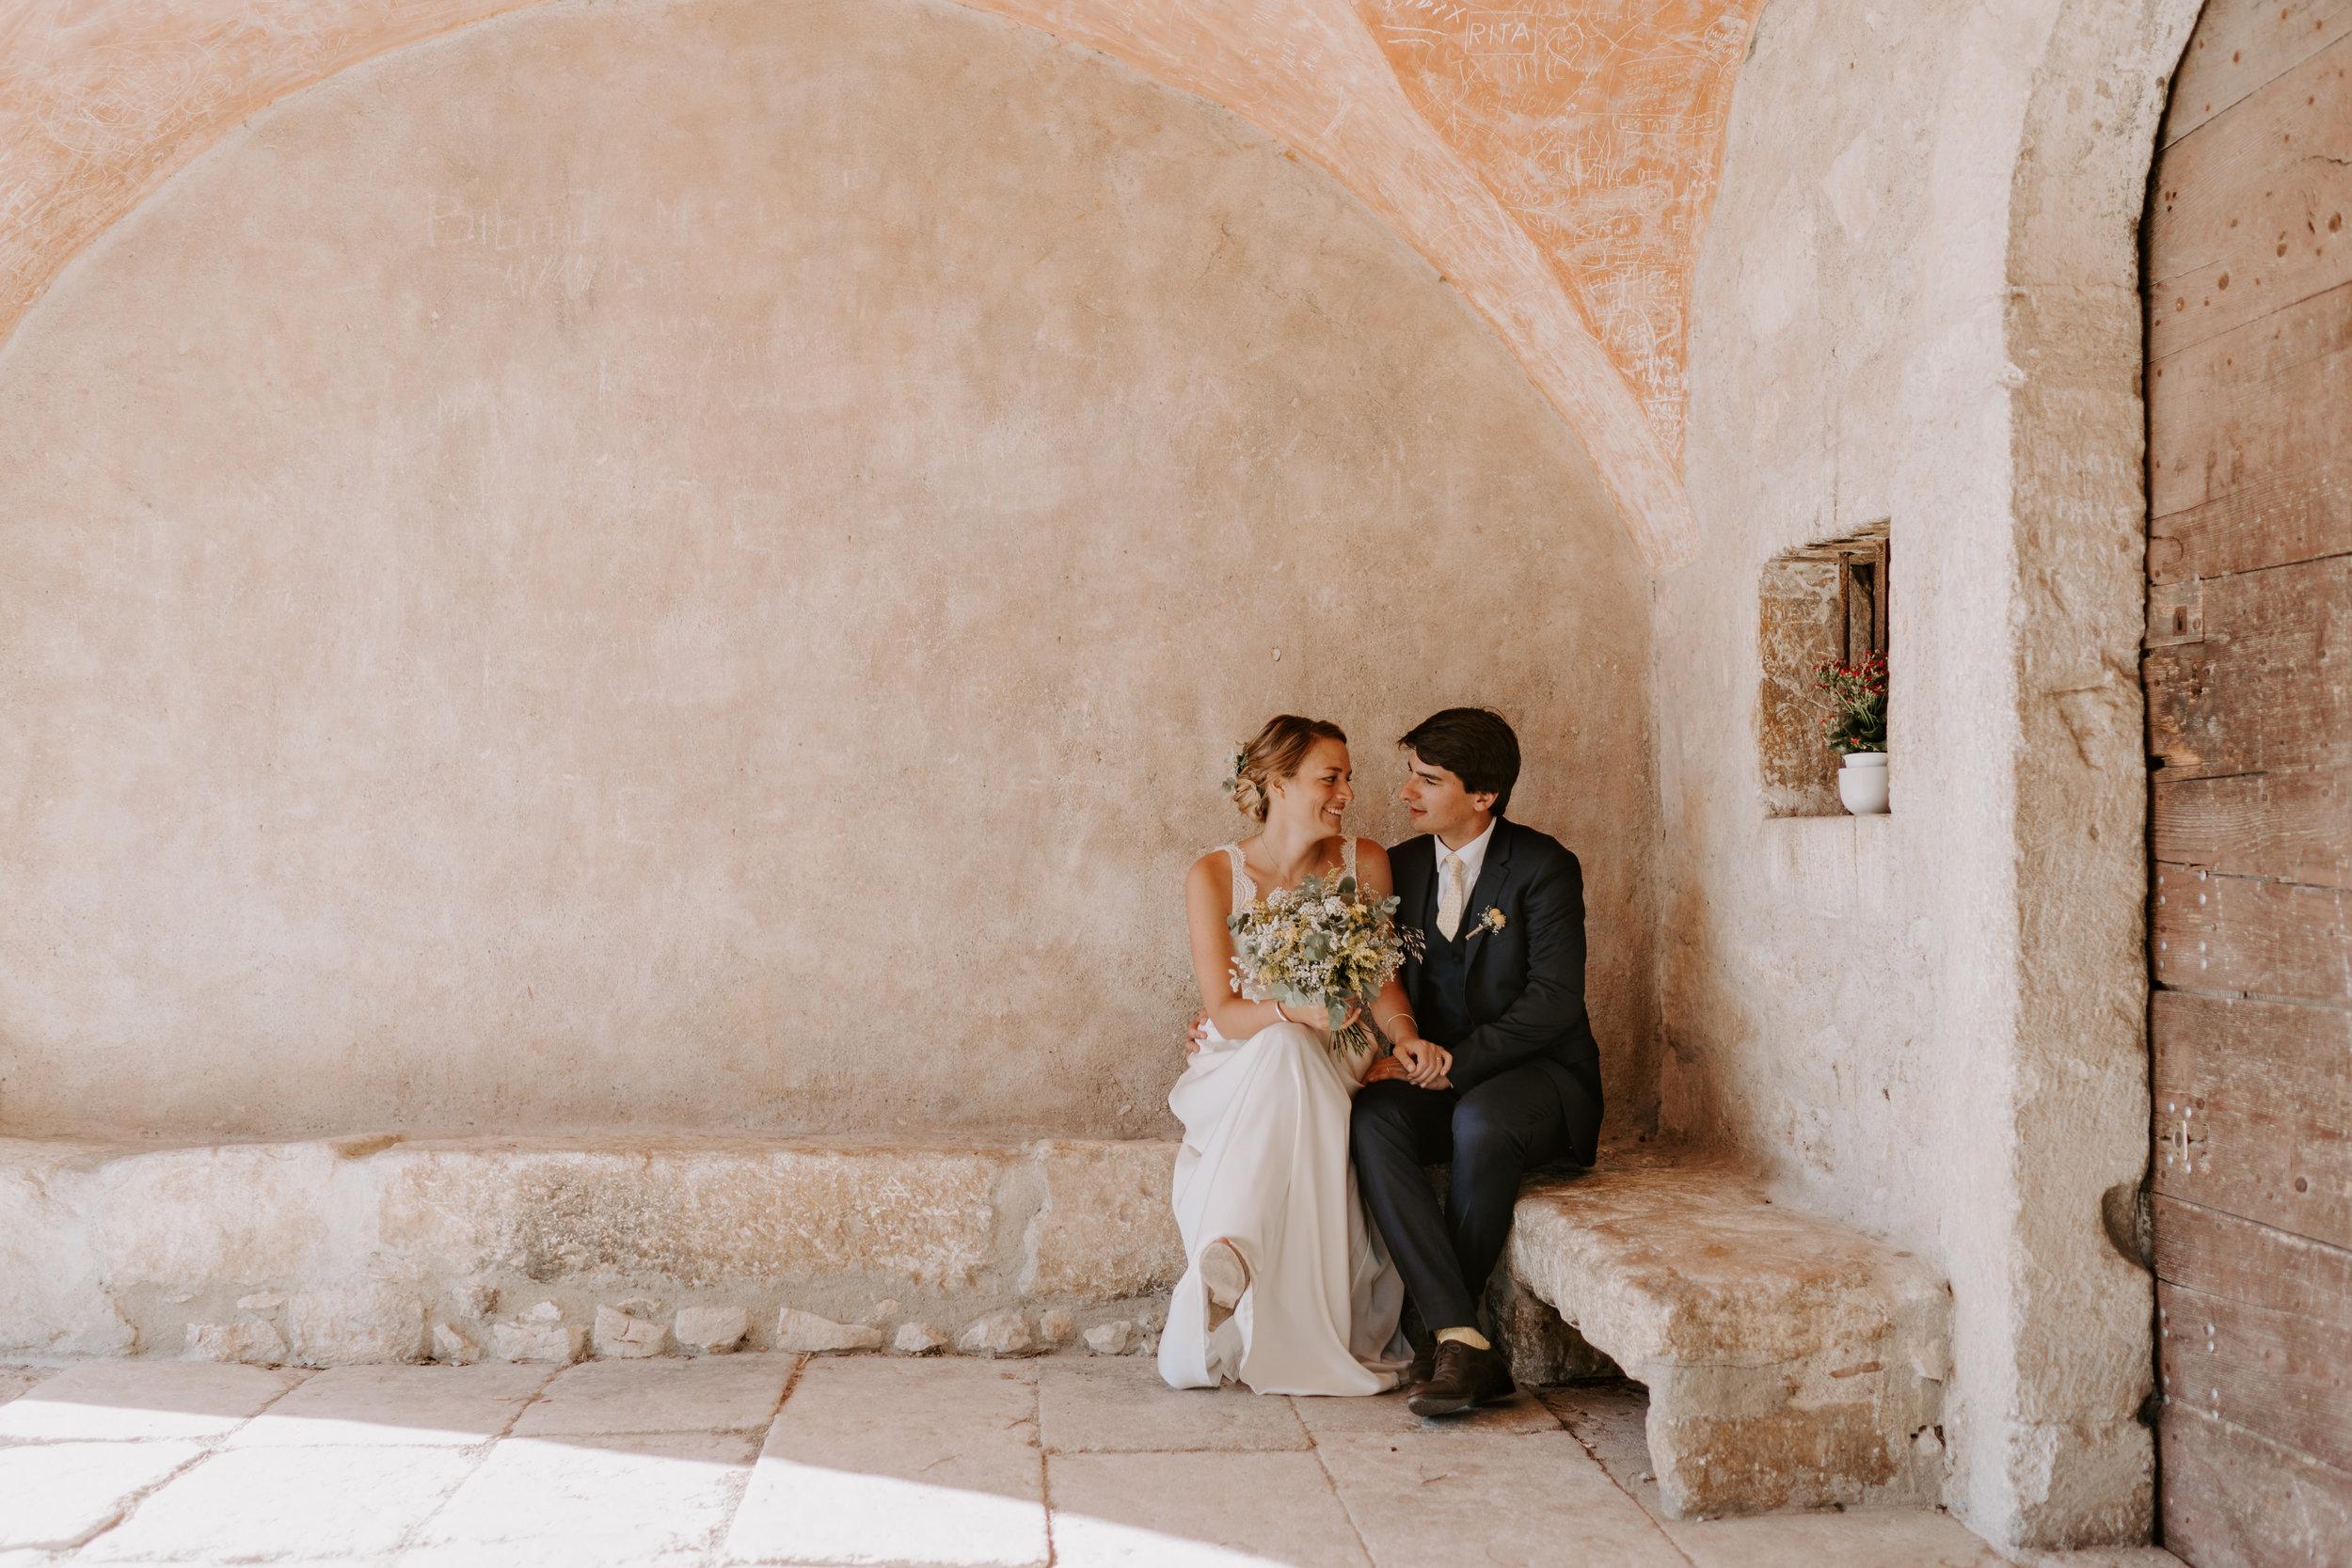 elsacaza_photographe_mariage_Juliette_Nicolas-380.jpg